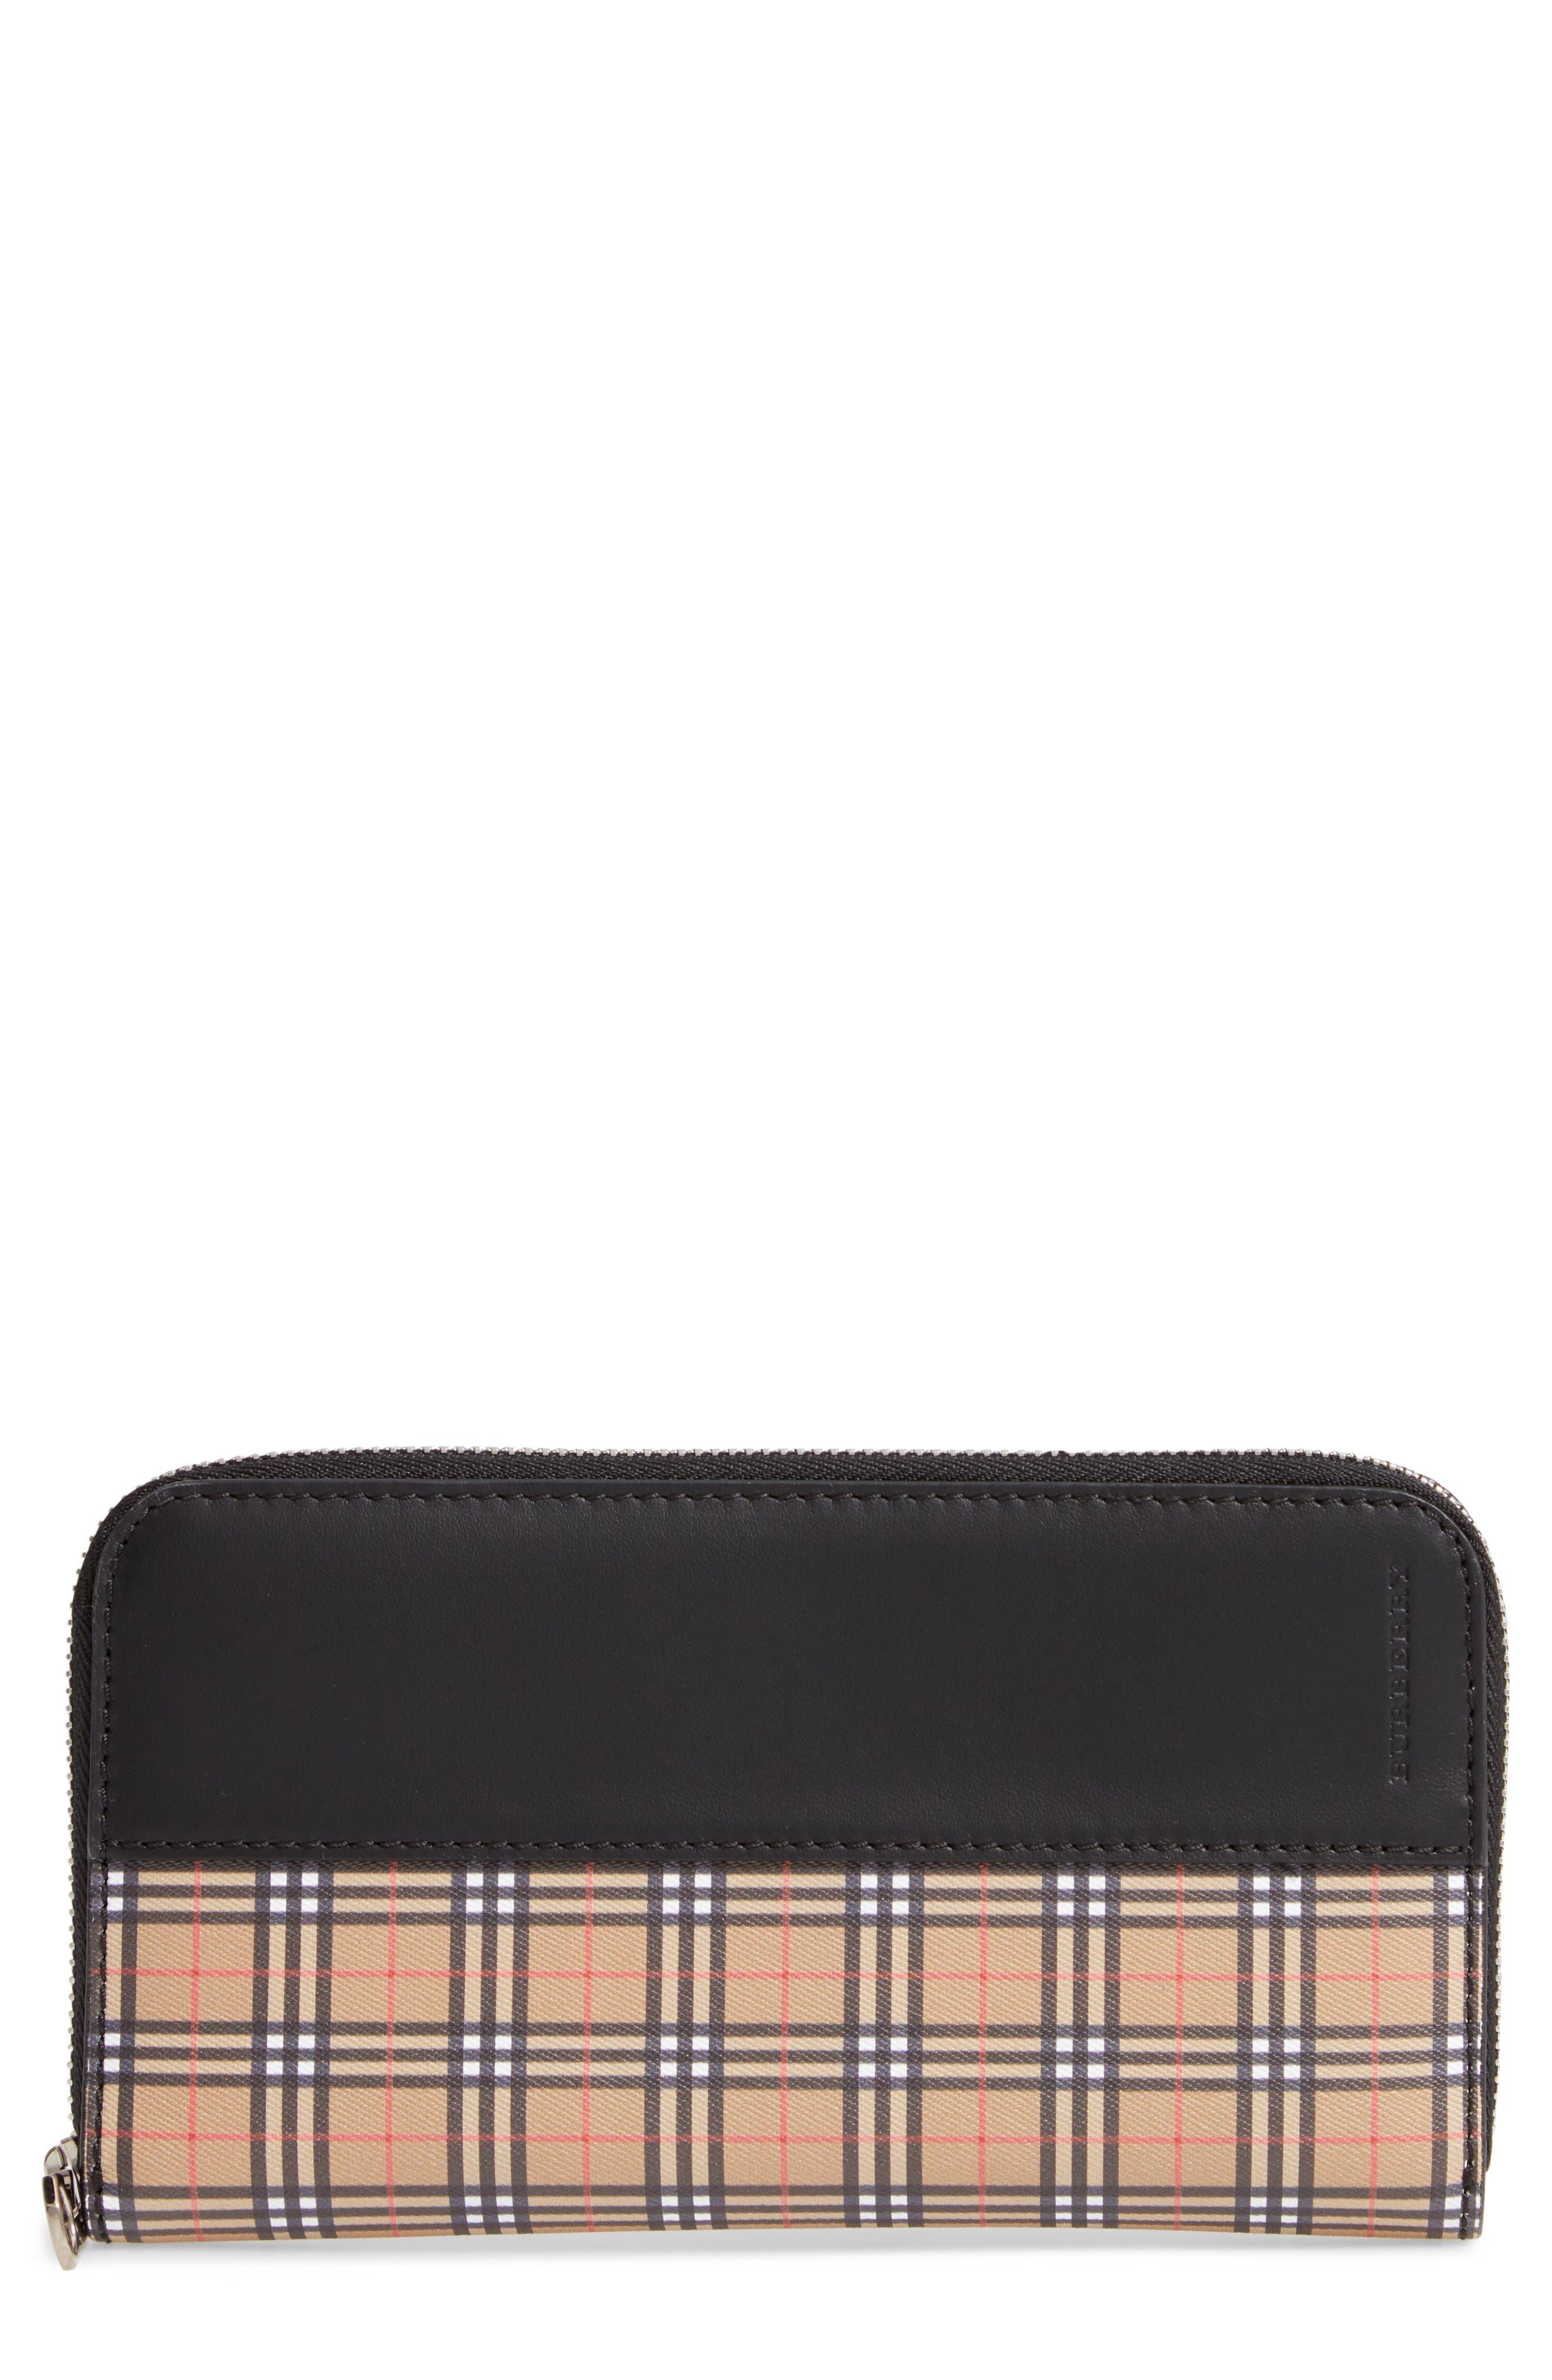 Mini Vintage Canvas Check & Leather Zip Around Wallet,                             Main thumbnail 1, color,                             ANTIQUE YELLOW/ BLACK